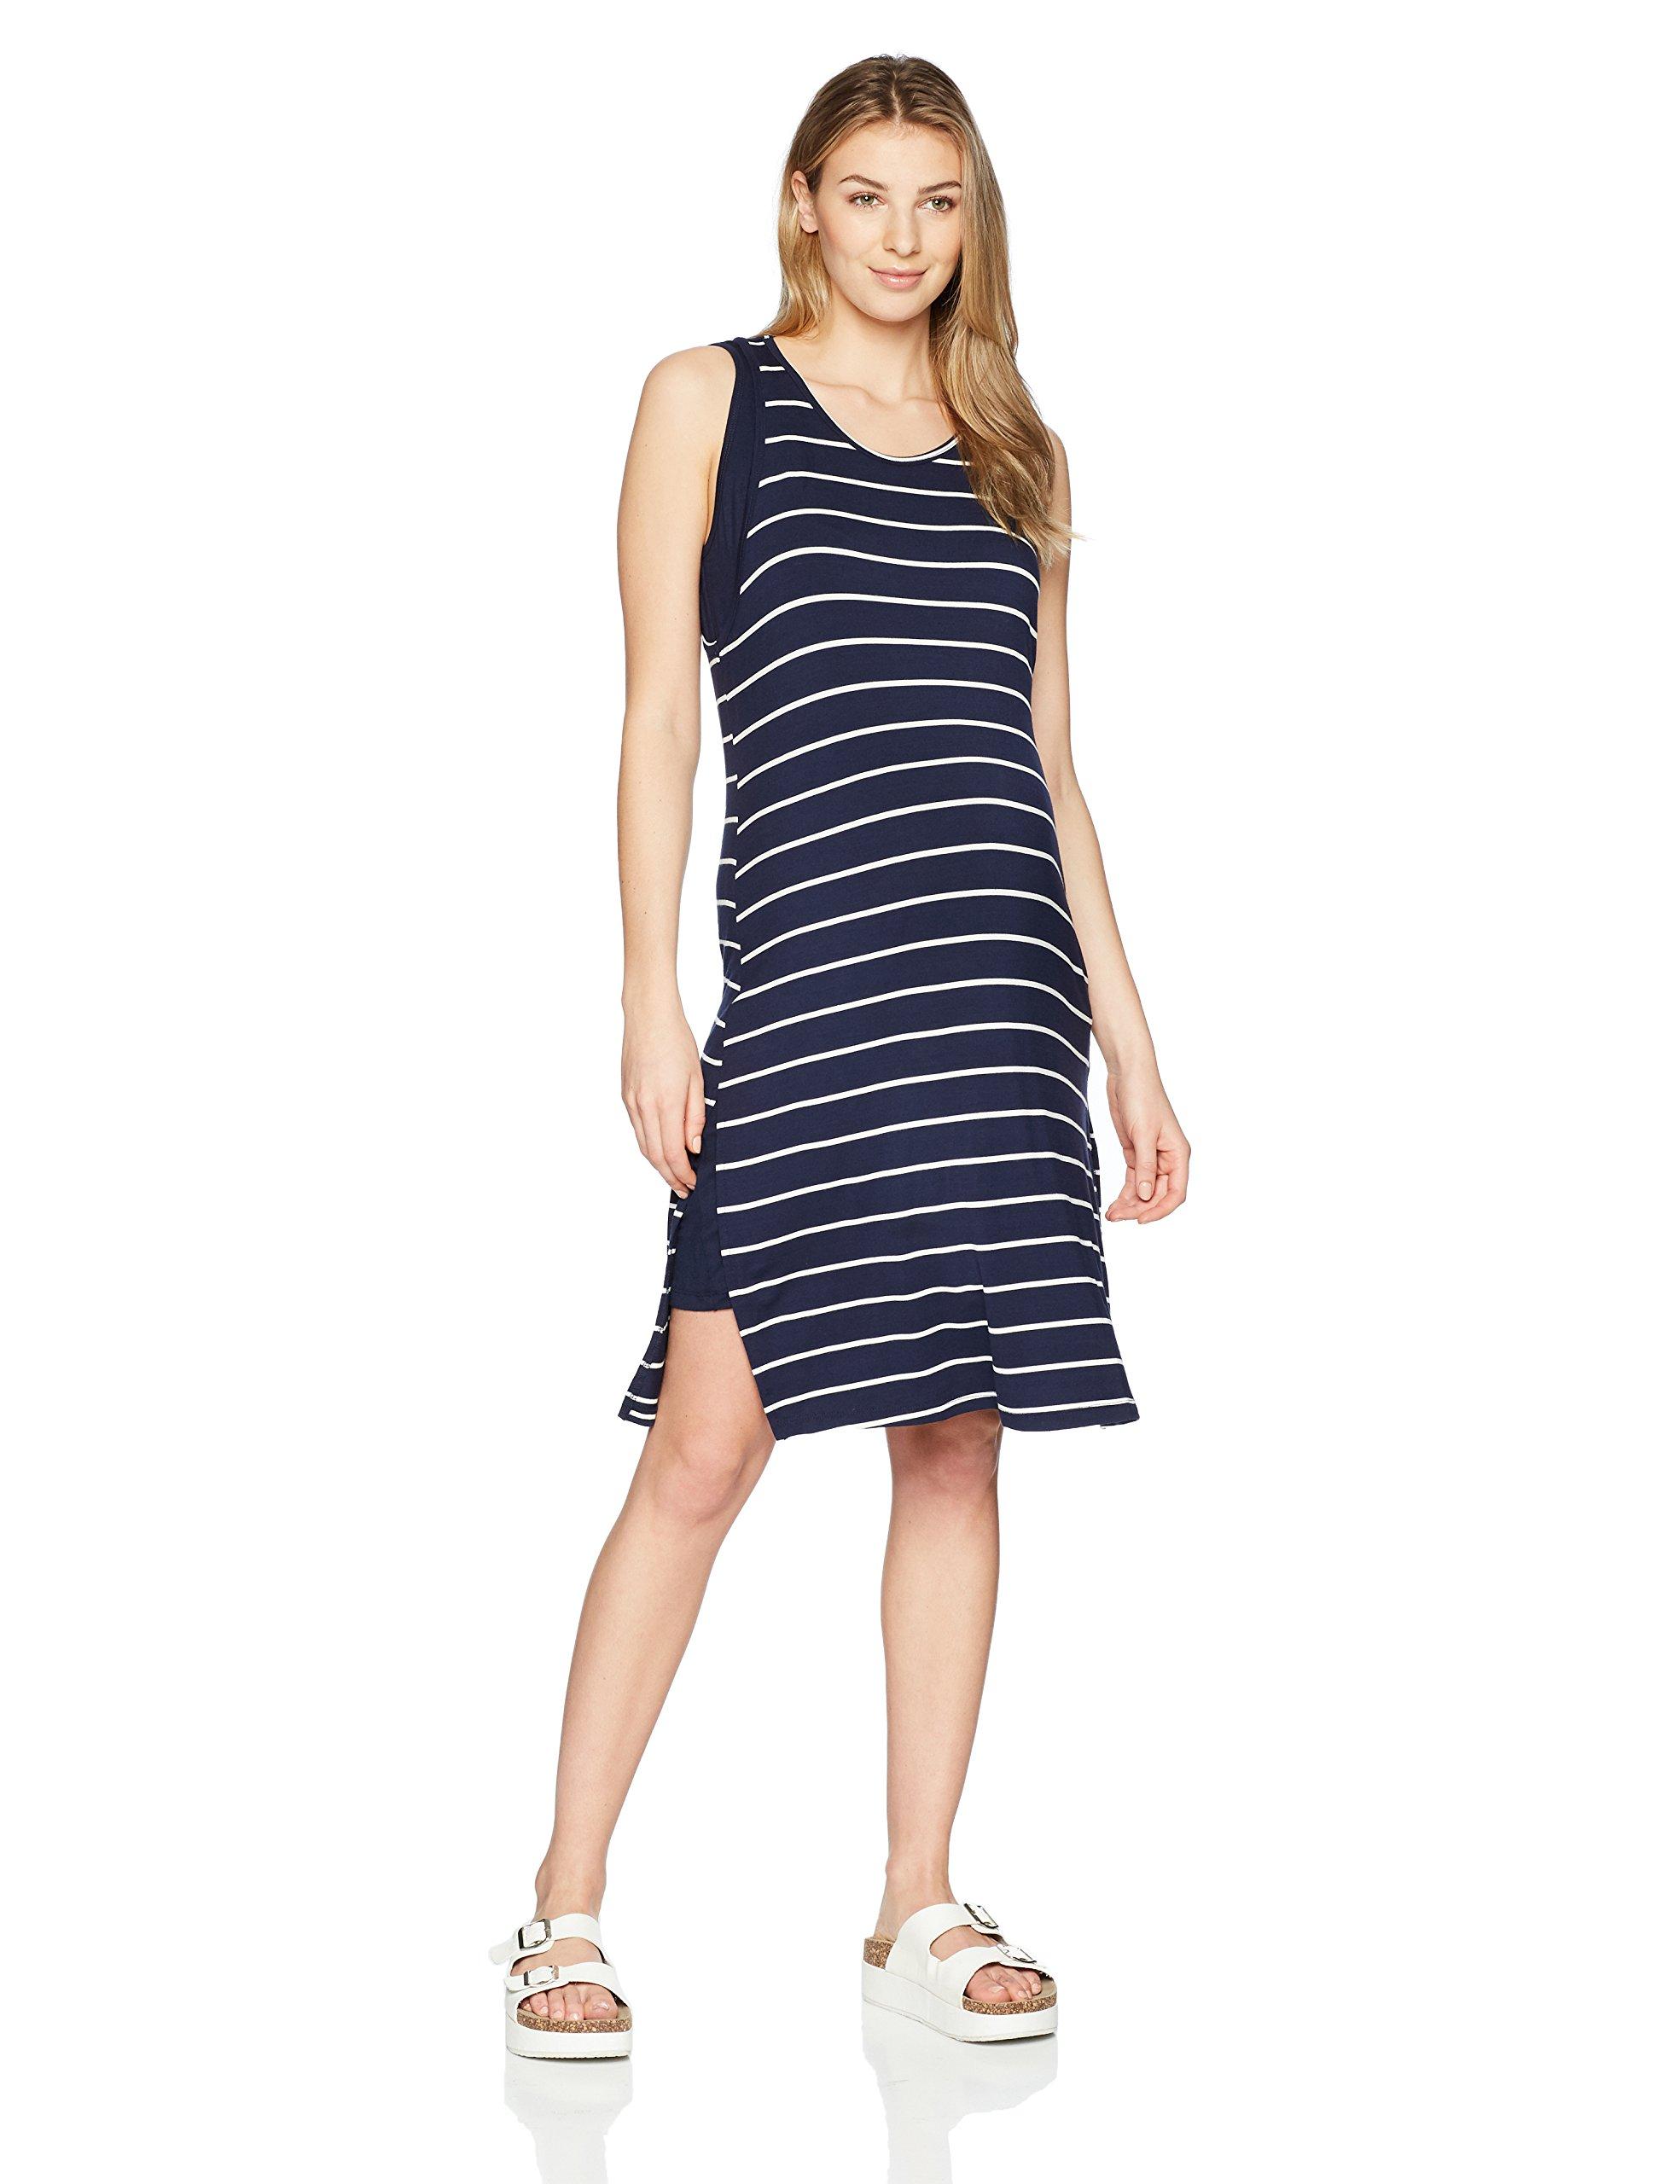 Everly Grey Women's Alex 2 Piece Maternity & Nursing Racerback Tank Dress, Navy Stripe, Small by Everly Grey